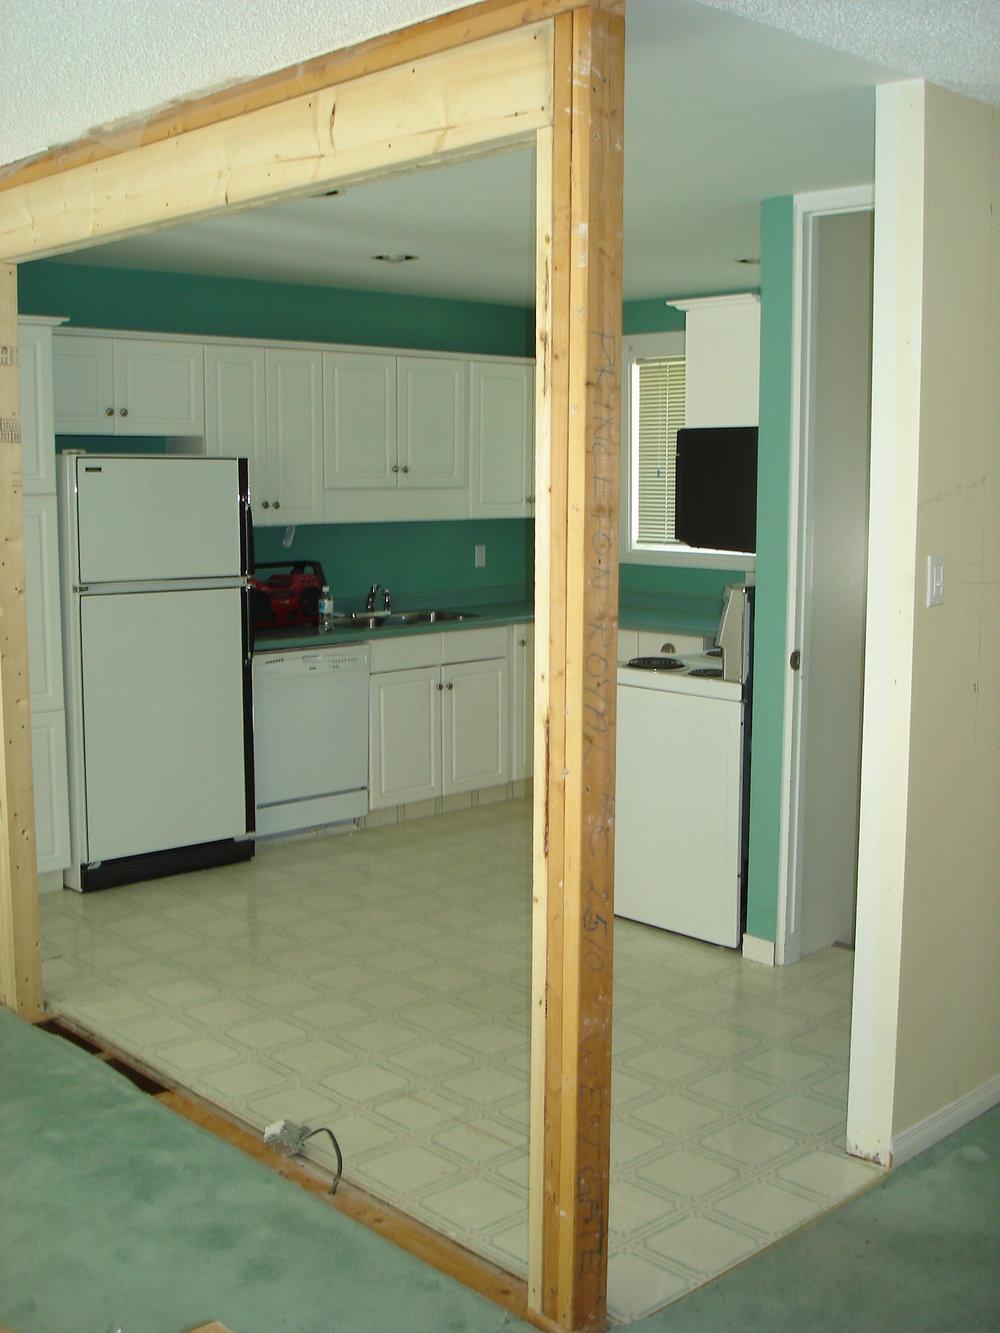 - Kitchen Reno: Before...